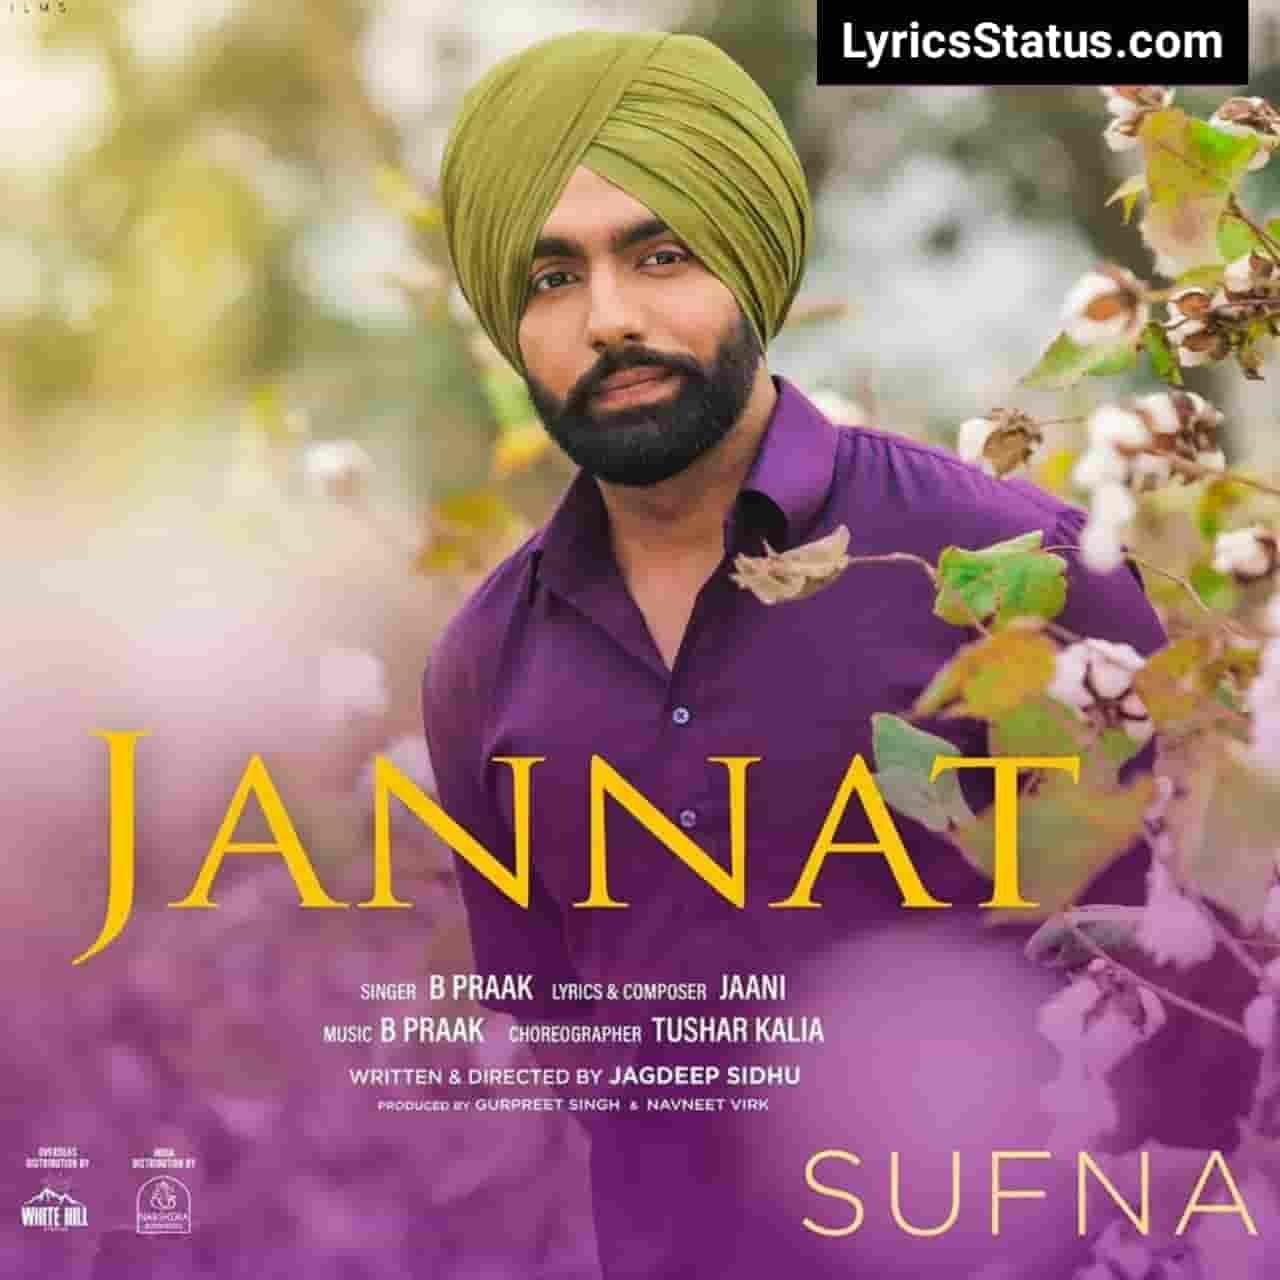 Jaani Ammy Virk Jannat B Praak Lyrics Status Download Video Teri har cheez jannat ae Ho jannat ae tera hasna New punjabi song Jannat of B Praak